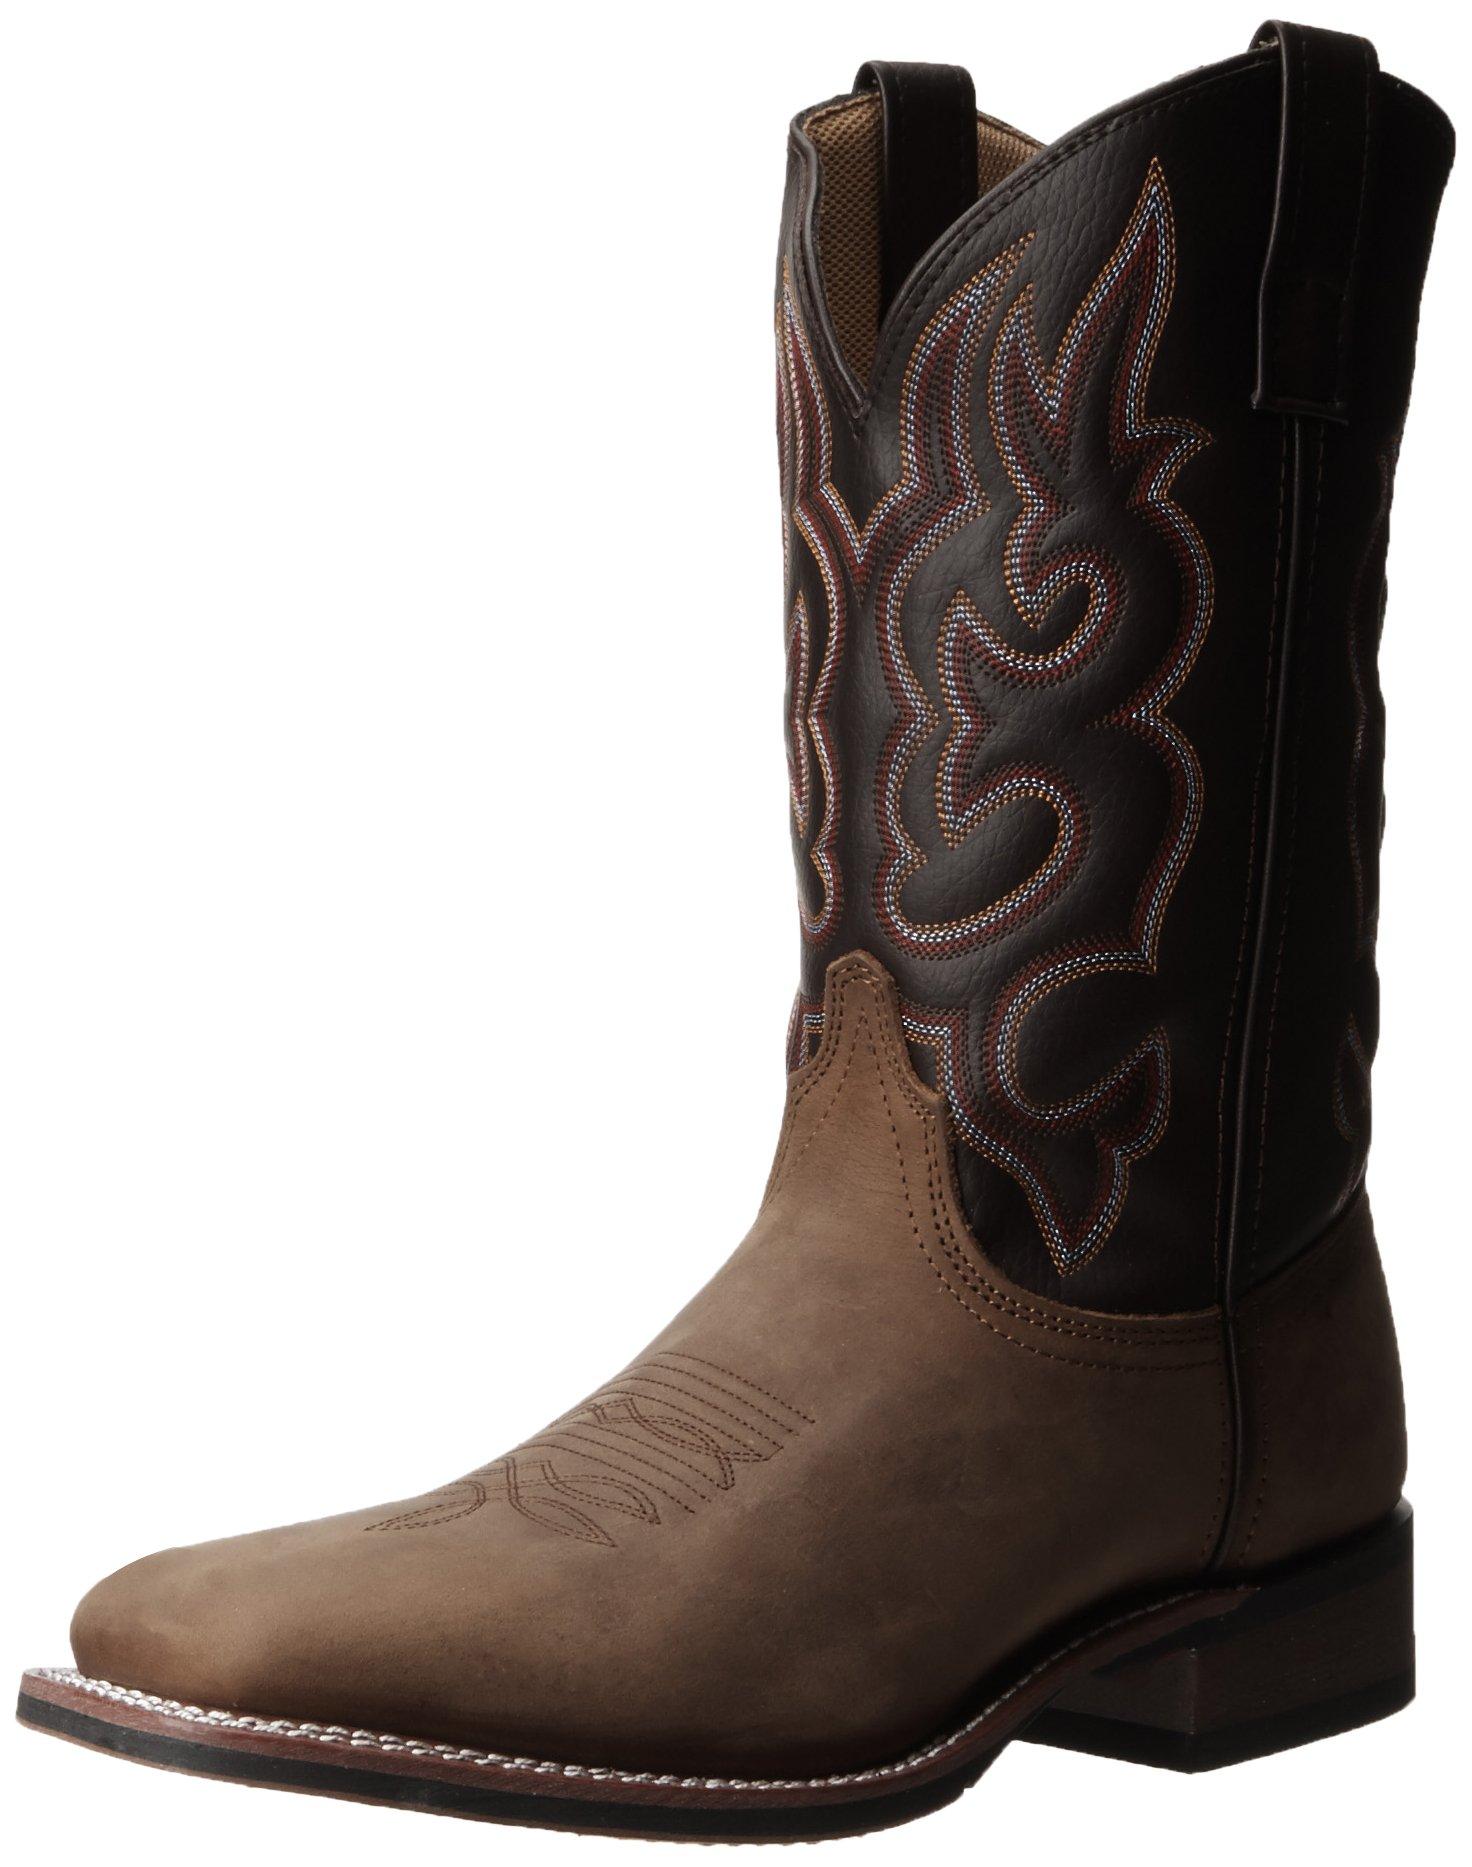 Laredo Men's Lodi Western Boot,Taupe/Chocolate,7.5 D US